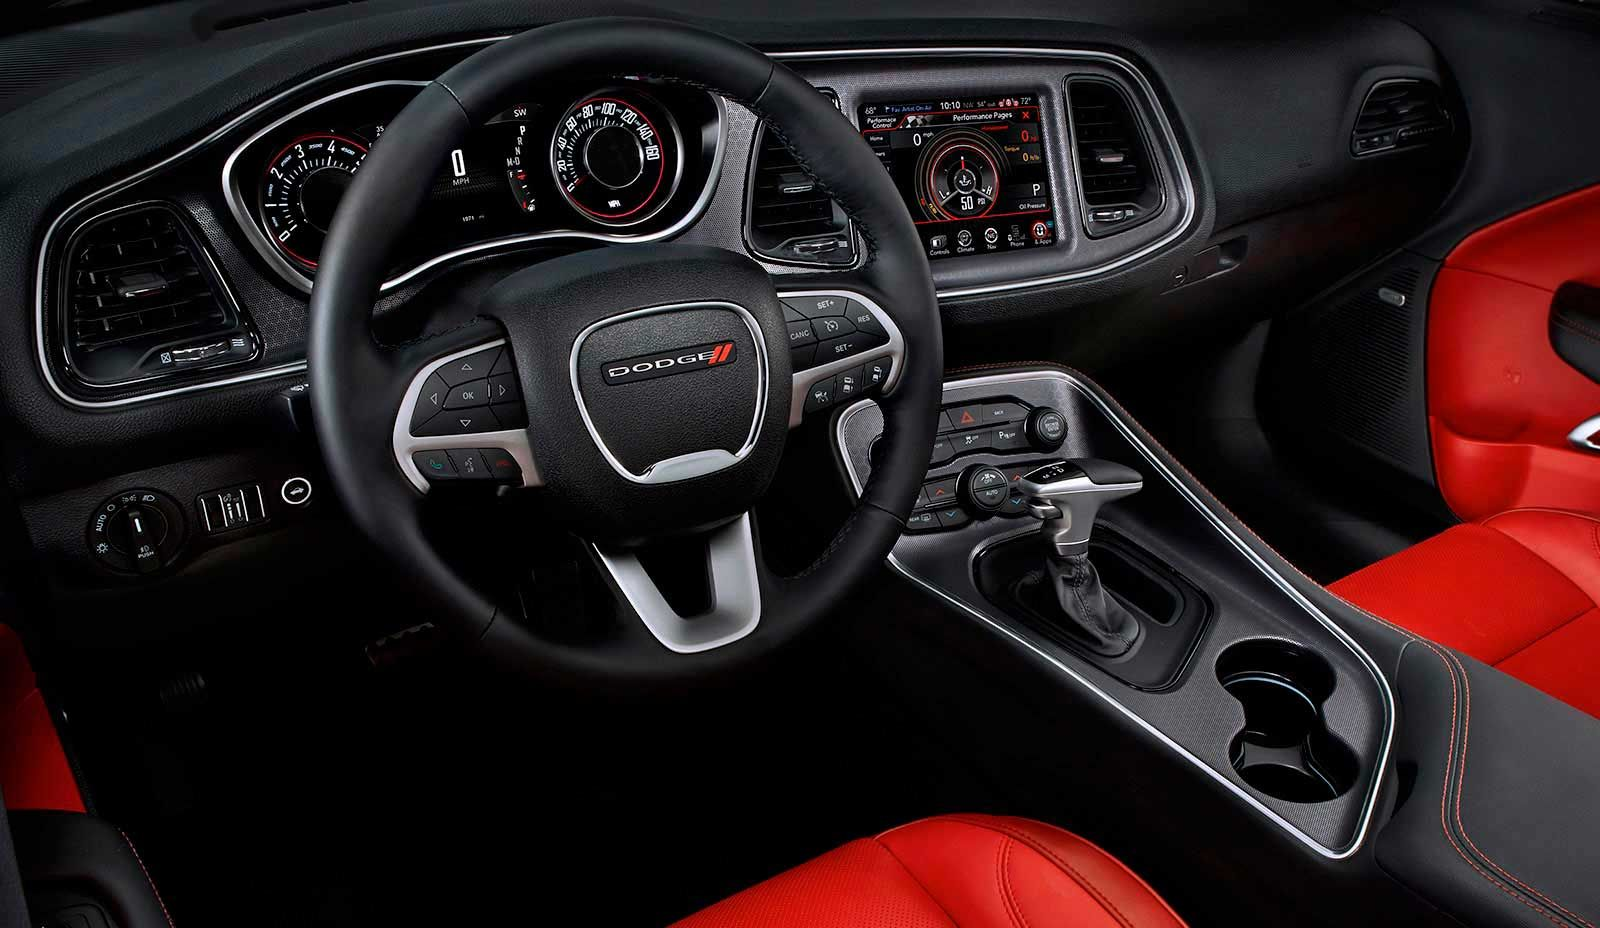 Pin De Jorge Vergara Vergara En Cosas Para Comprar En 2020 Dodge Challenger Dodge Charger Dodge